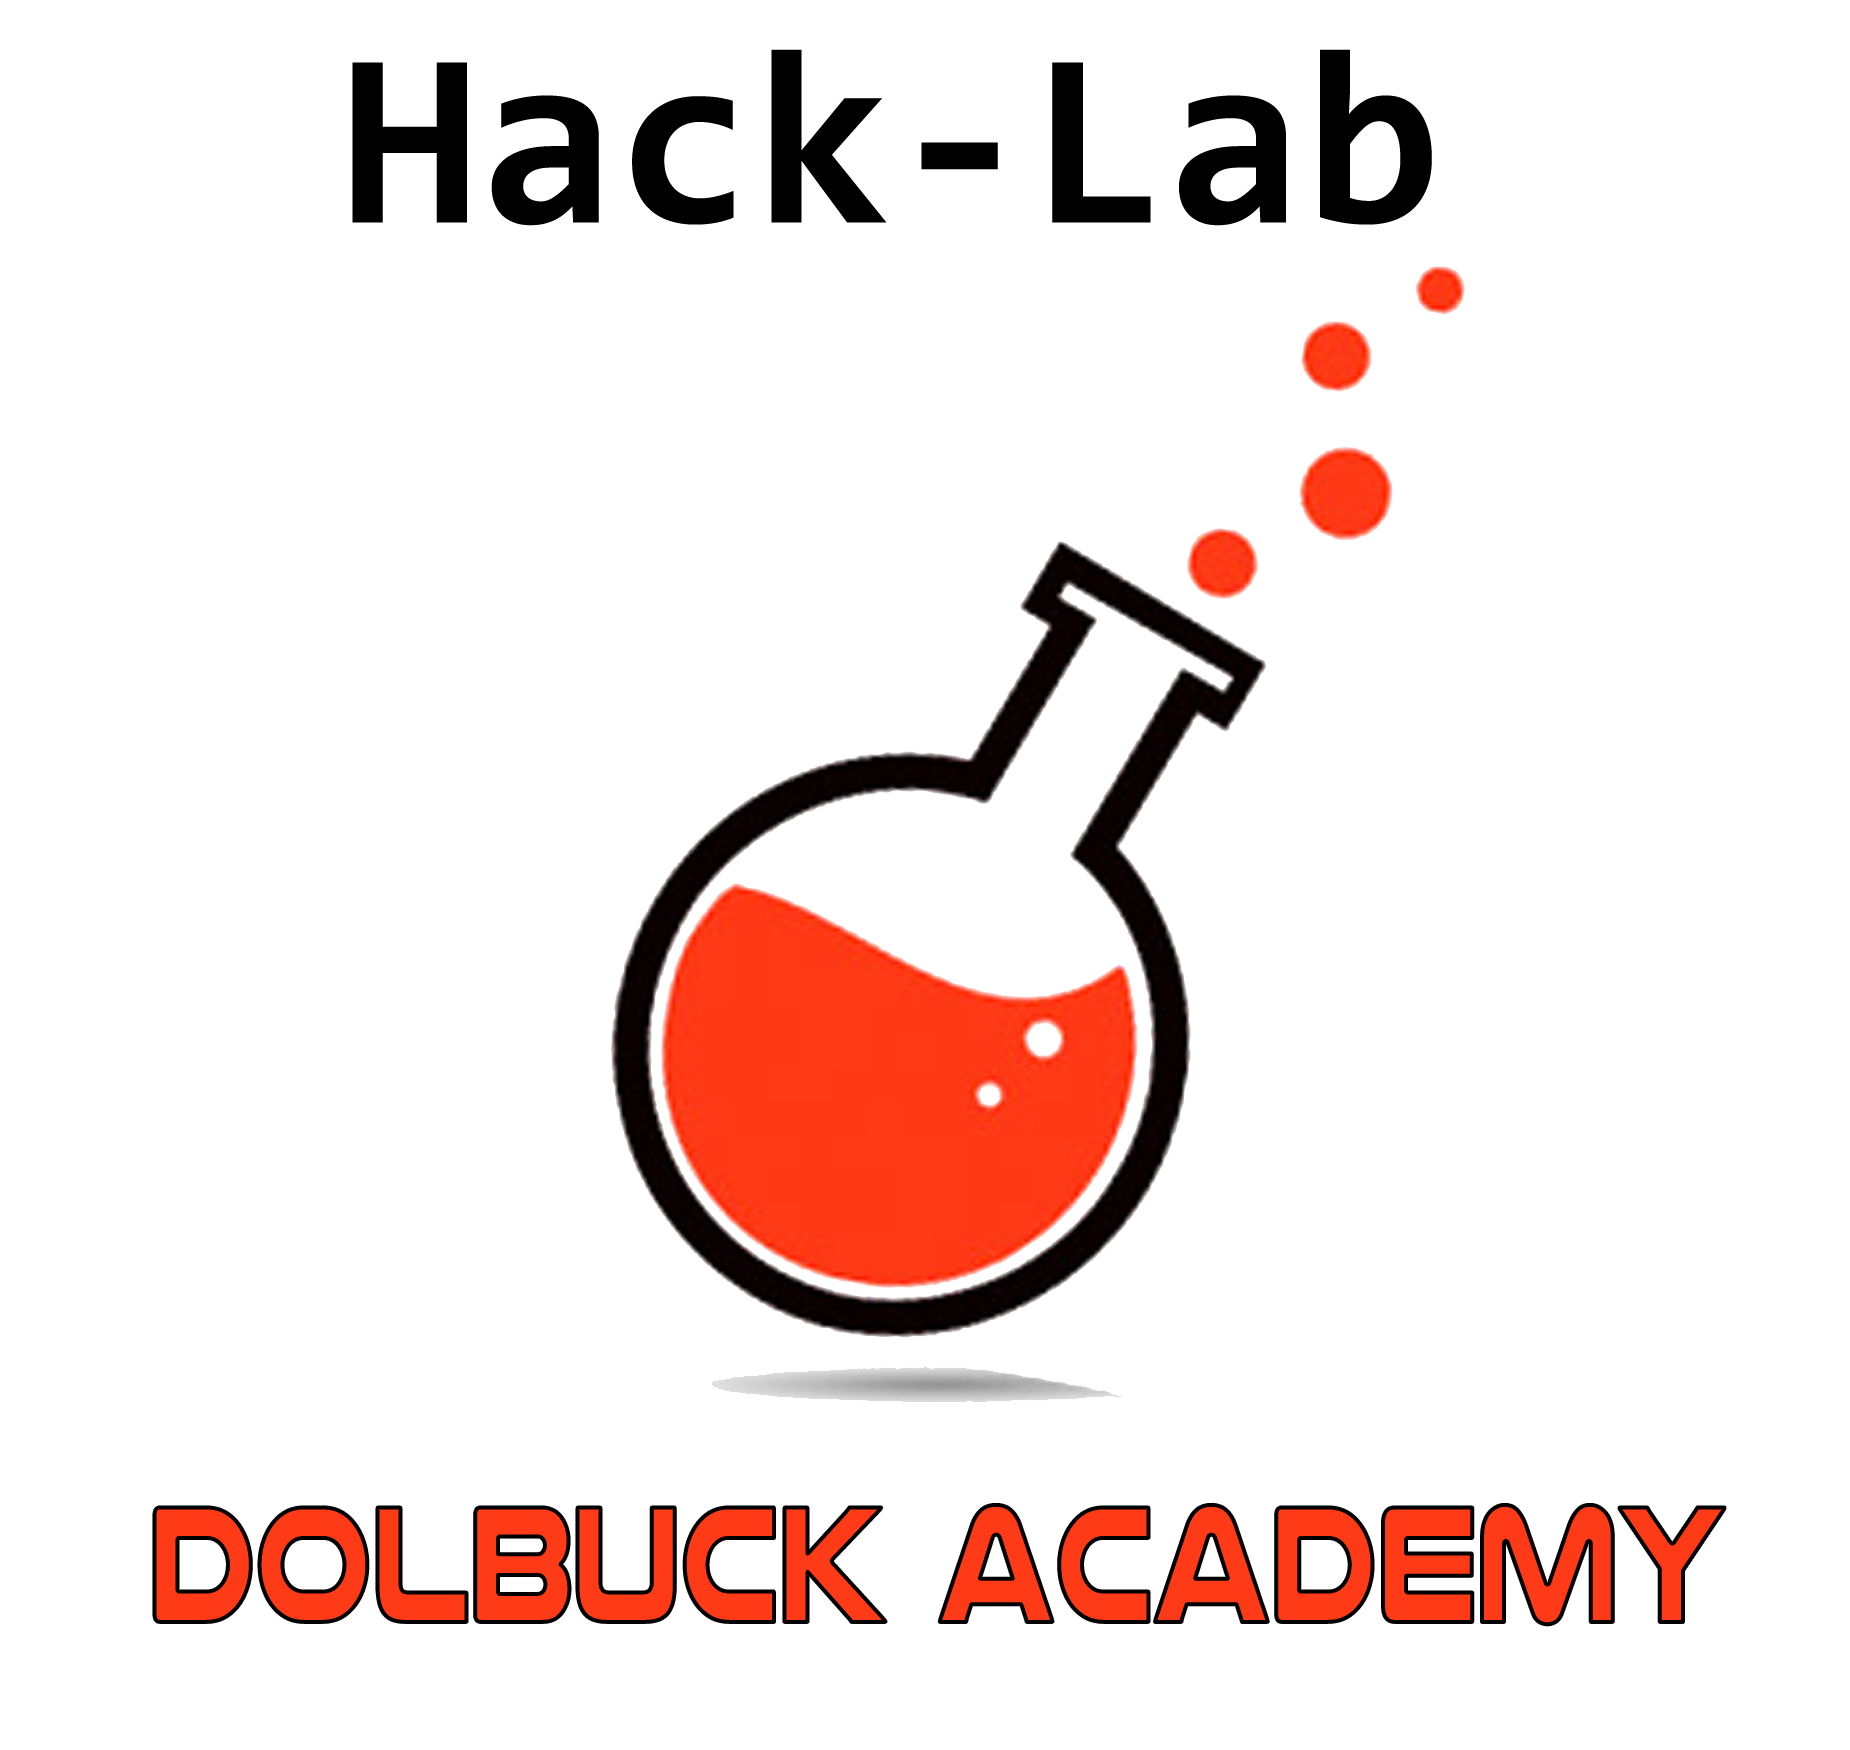 hack-lab